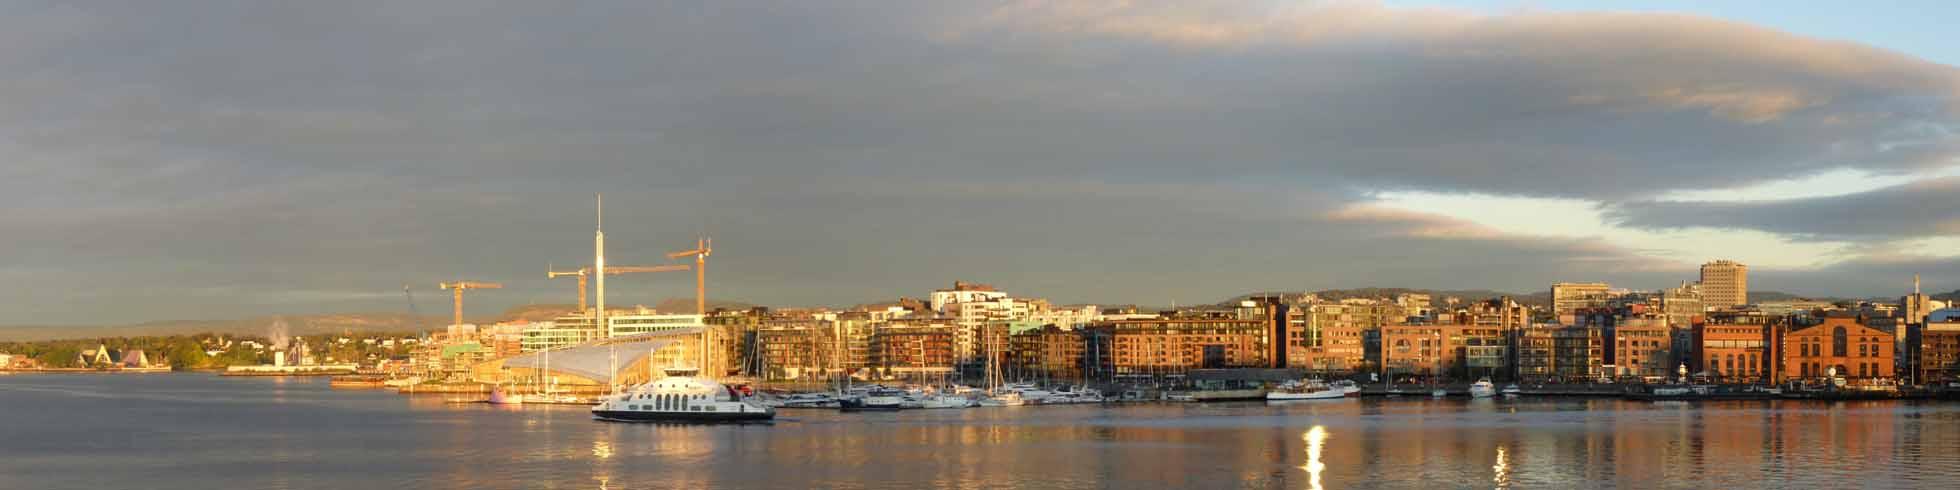 Forex oslo city